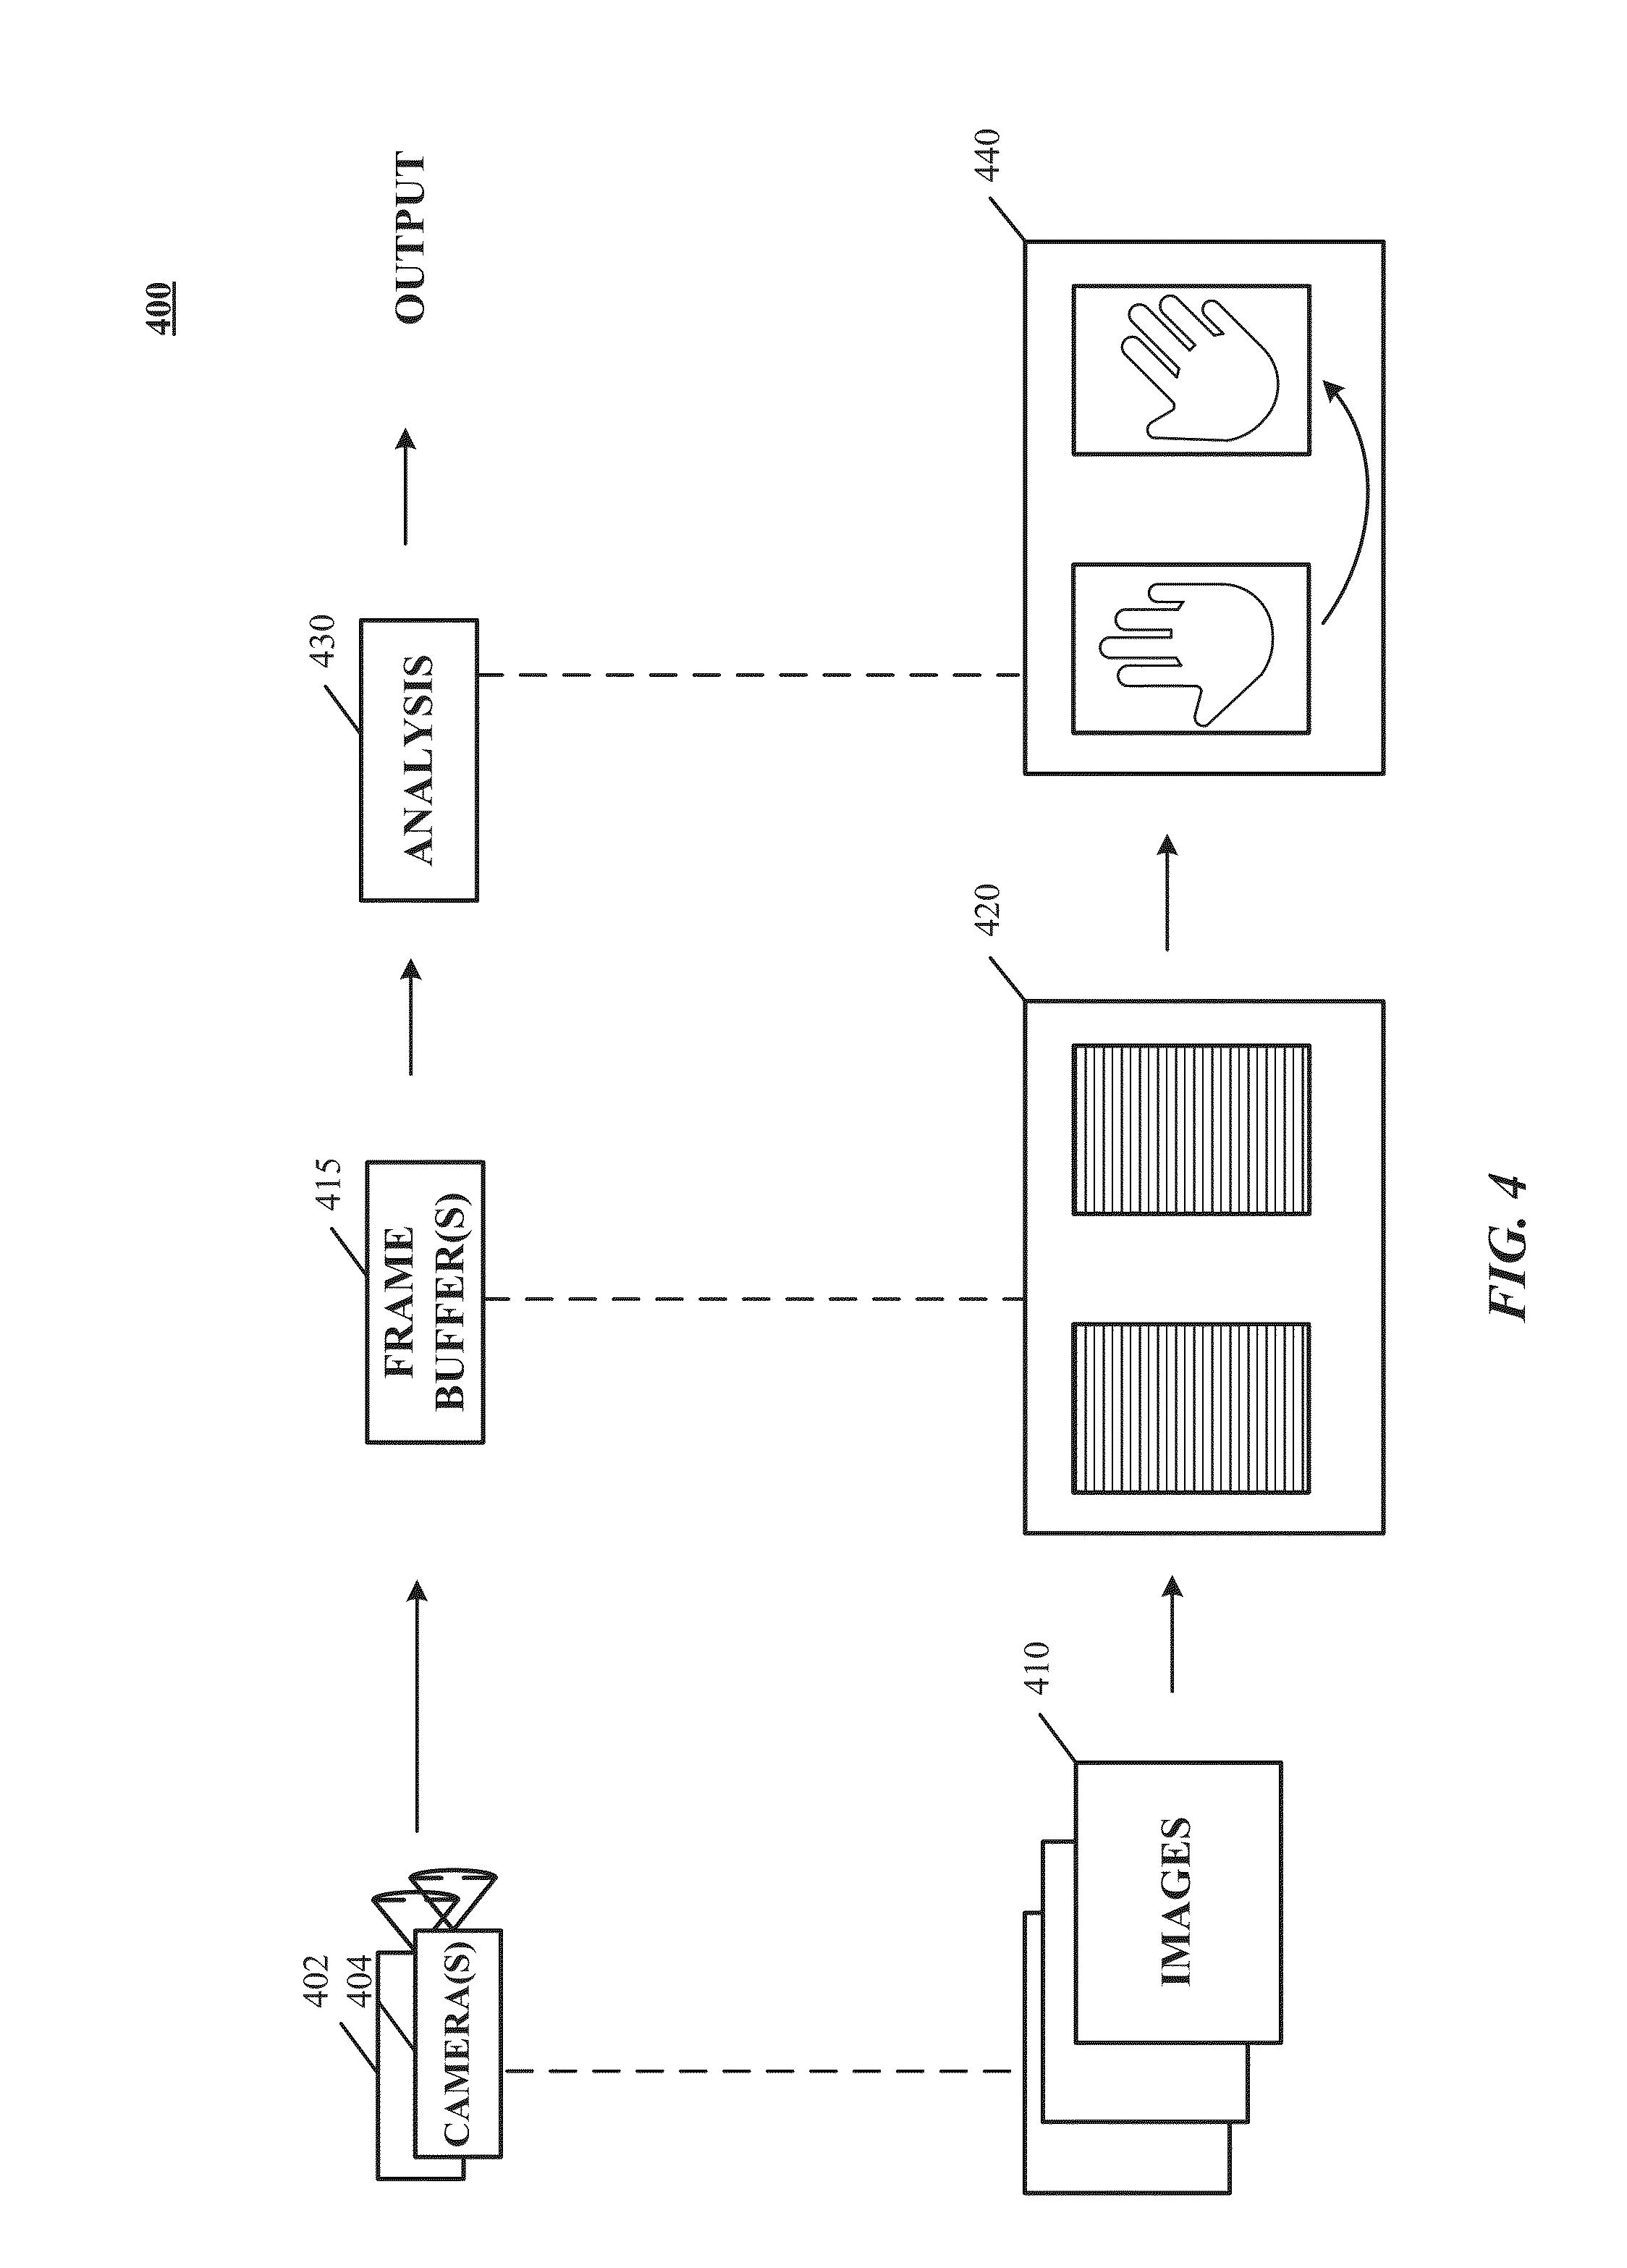 Patent Us 20160048725a1 Logic Combi 30 Diagram 0 Petitions